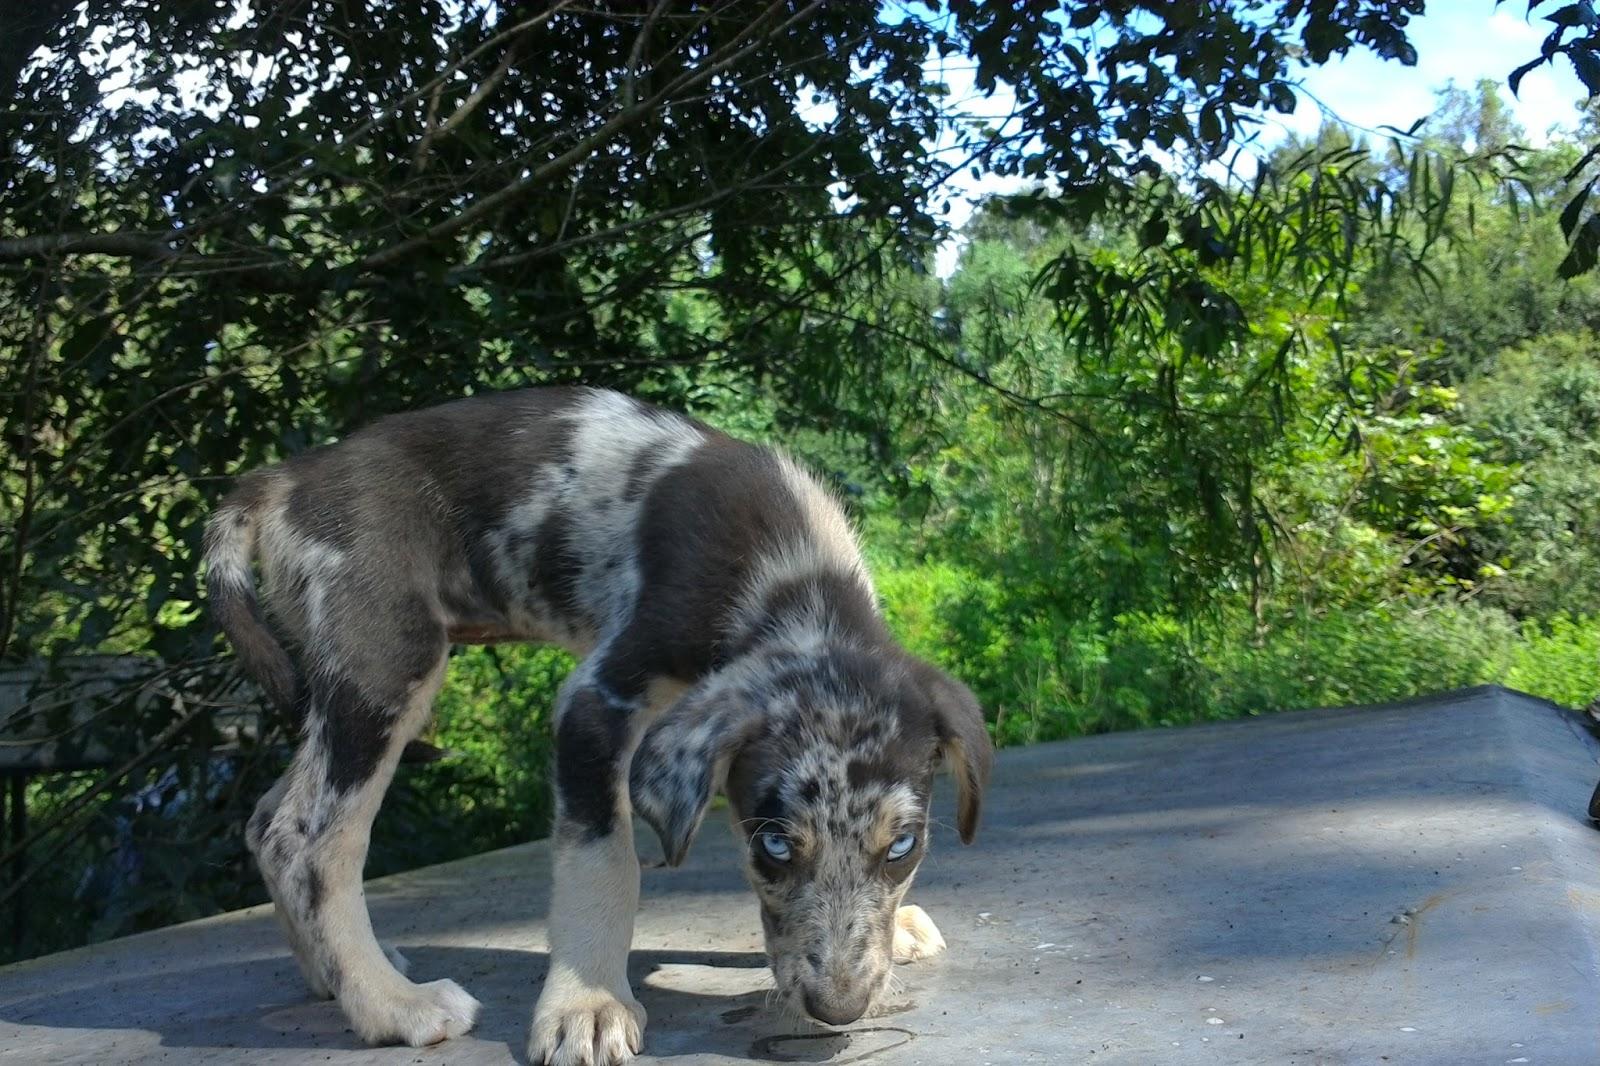 Catahoula Puppies: Catahoula Puppies 'for sale' Rita Mae's 1